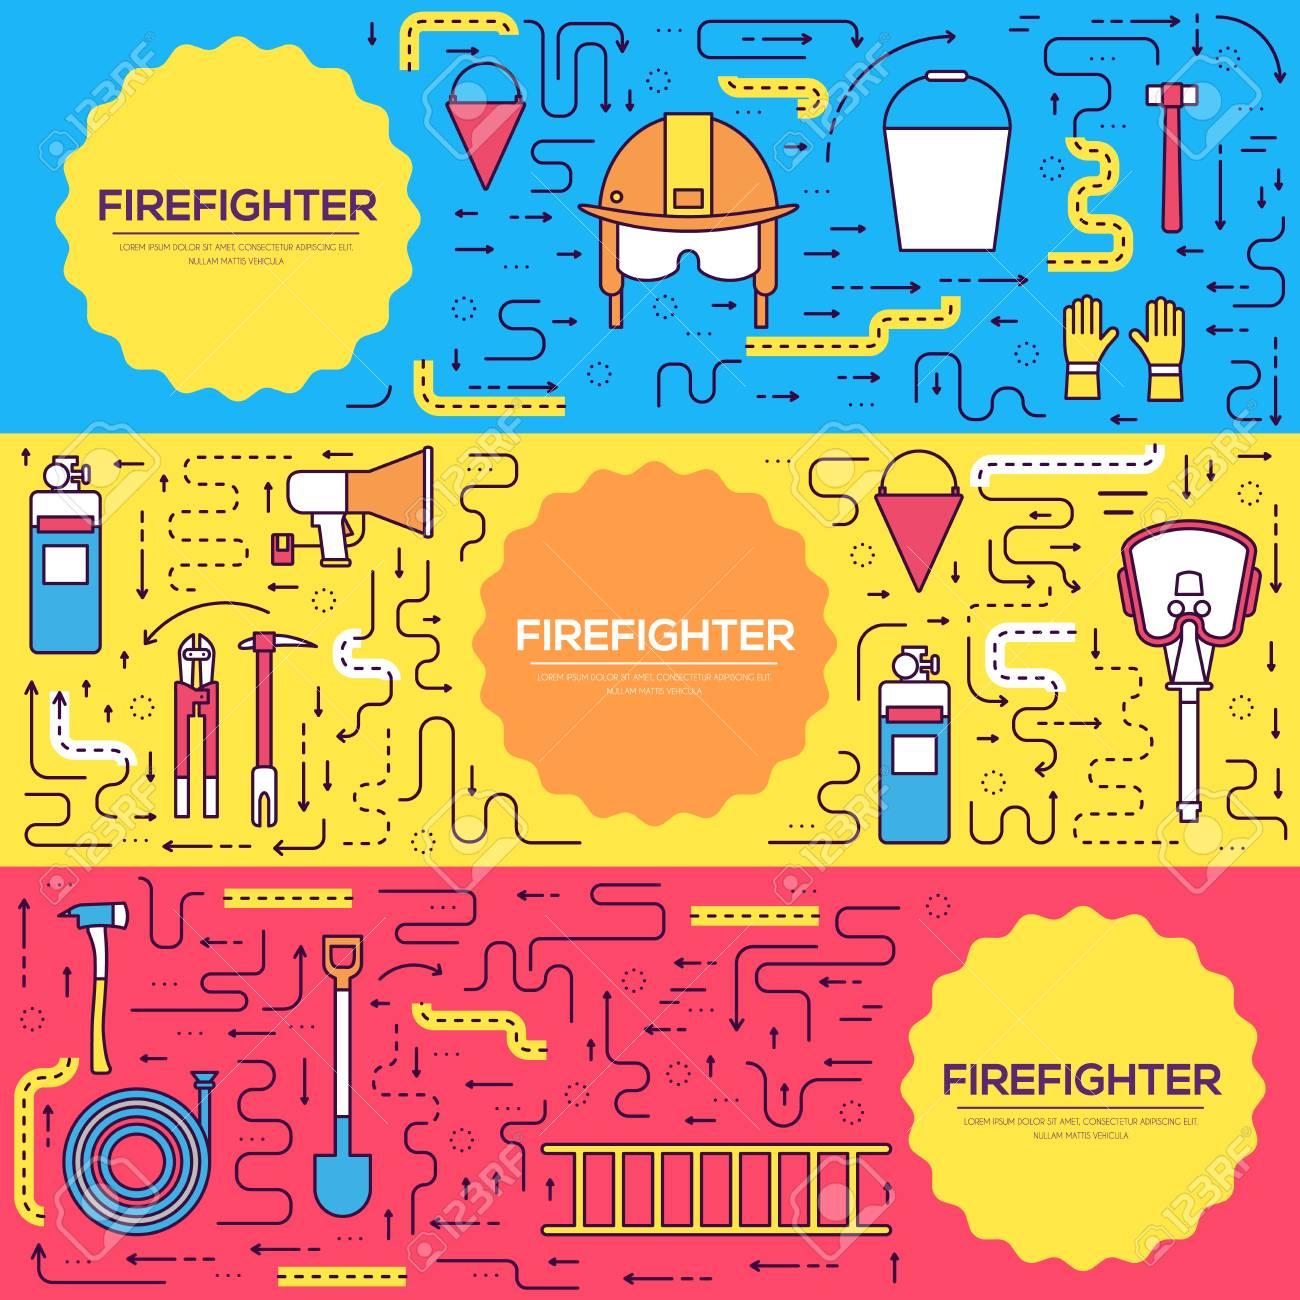 firefighter clipart.html